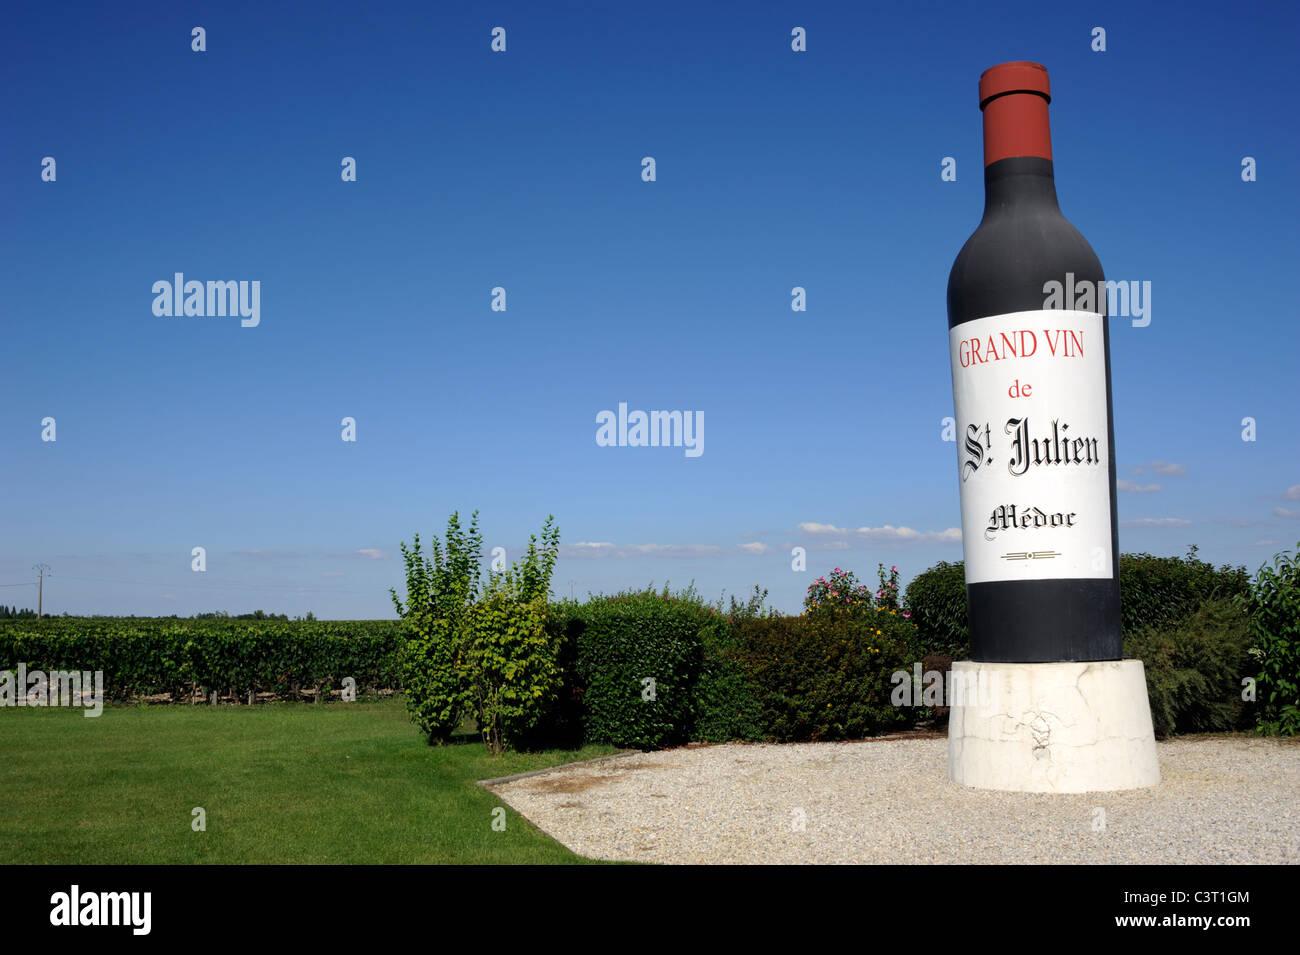 france, bordeaux, medoc vineyards, giant wine bottle - Stock Image